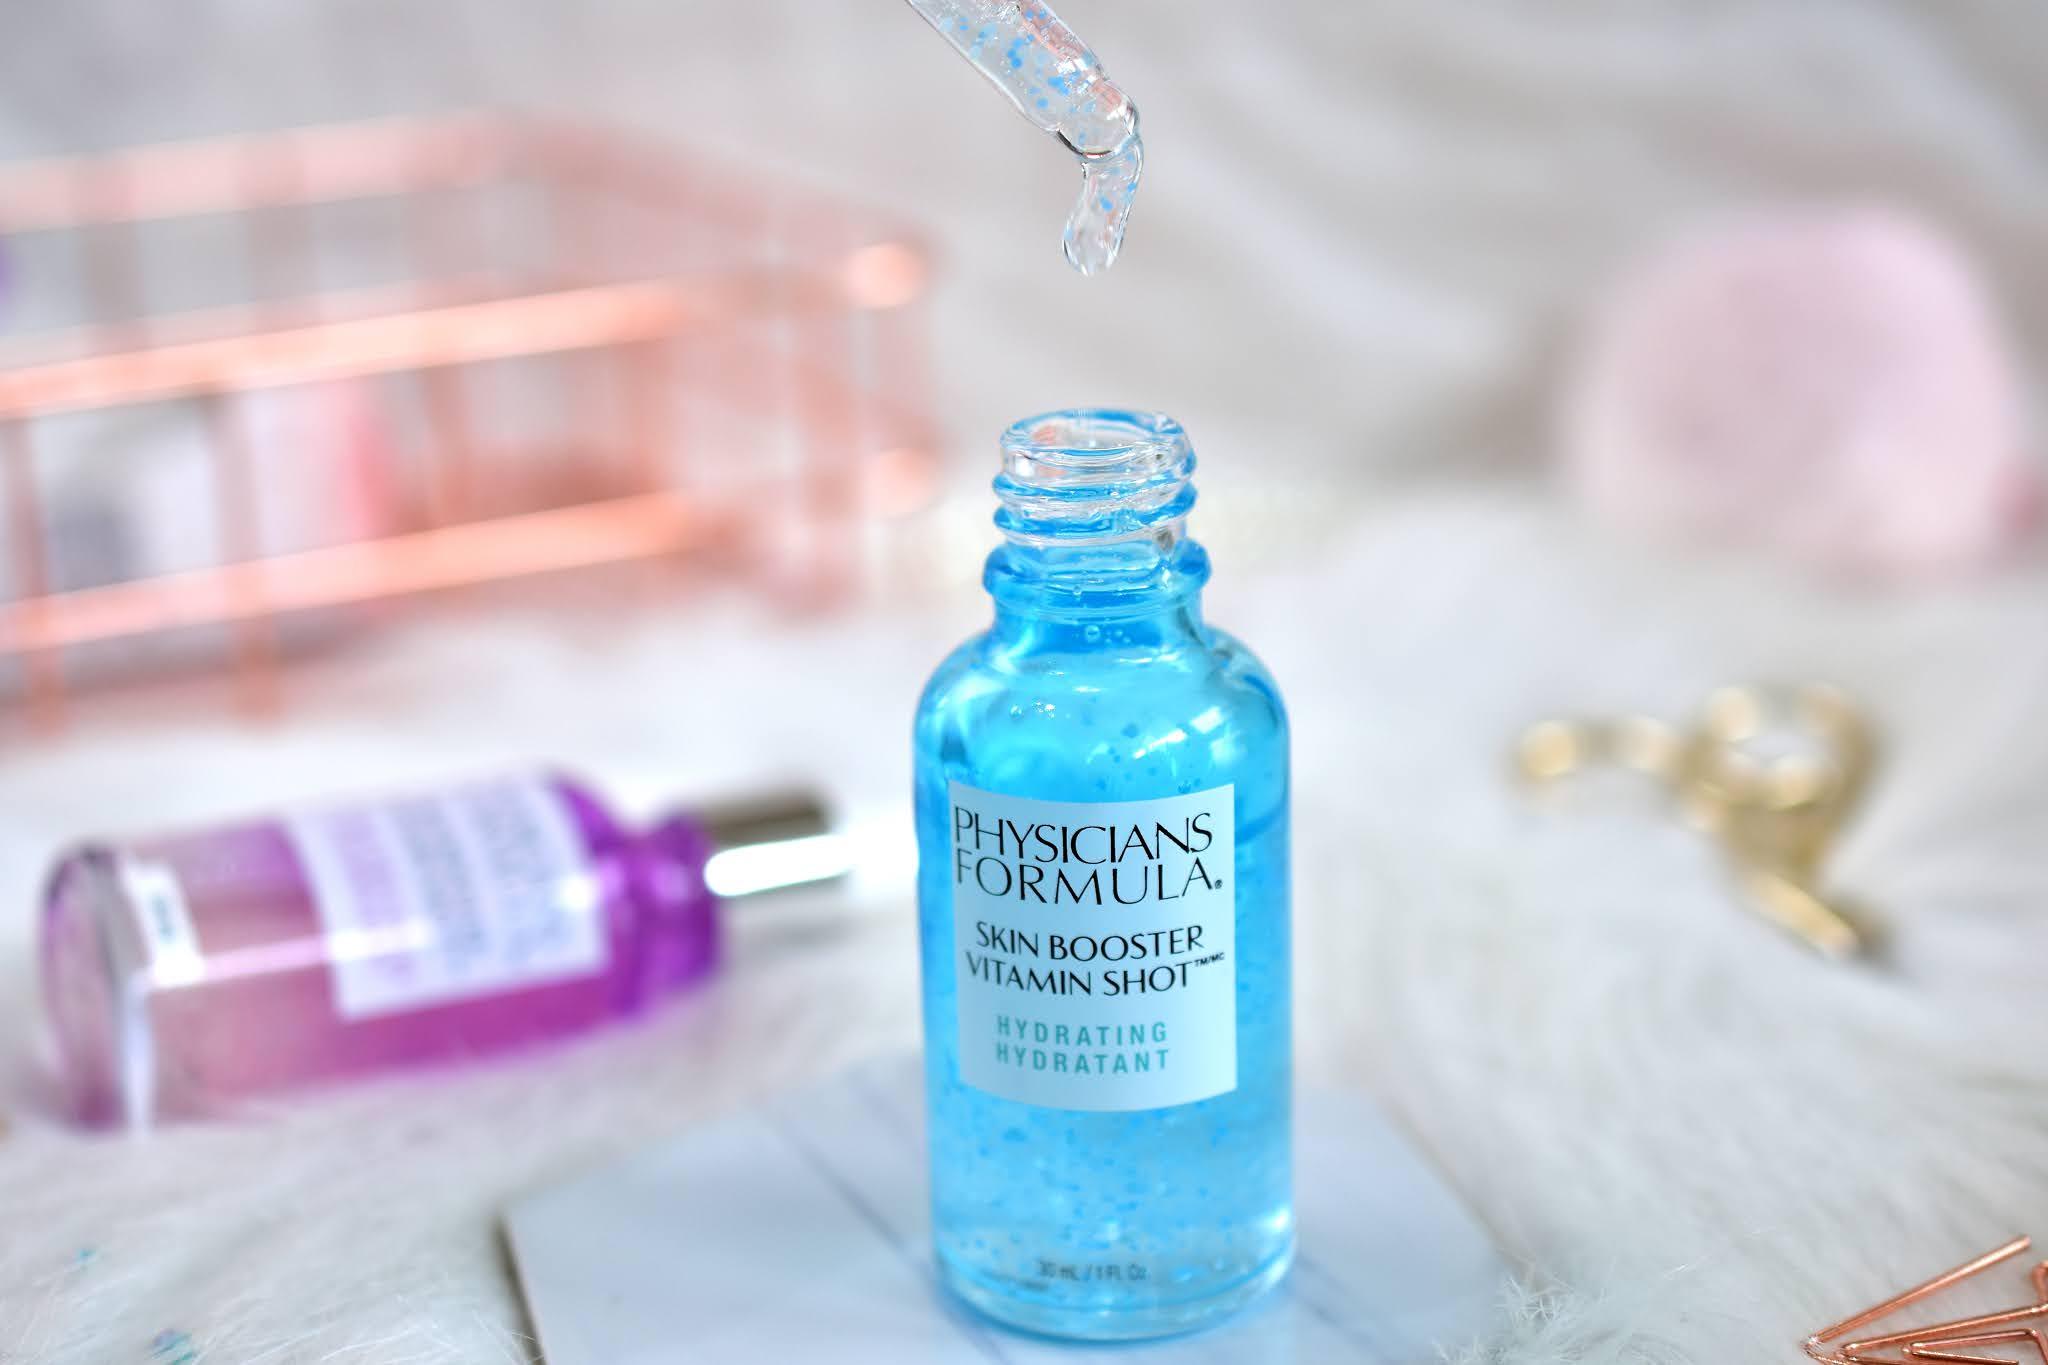 physicians formula skin booster vitamin shot